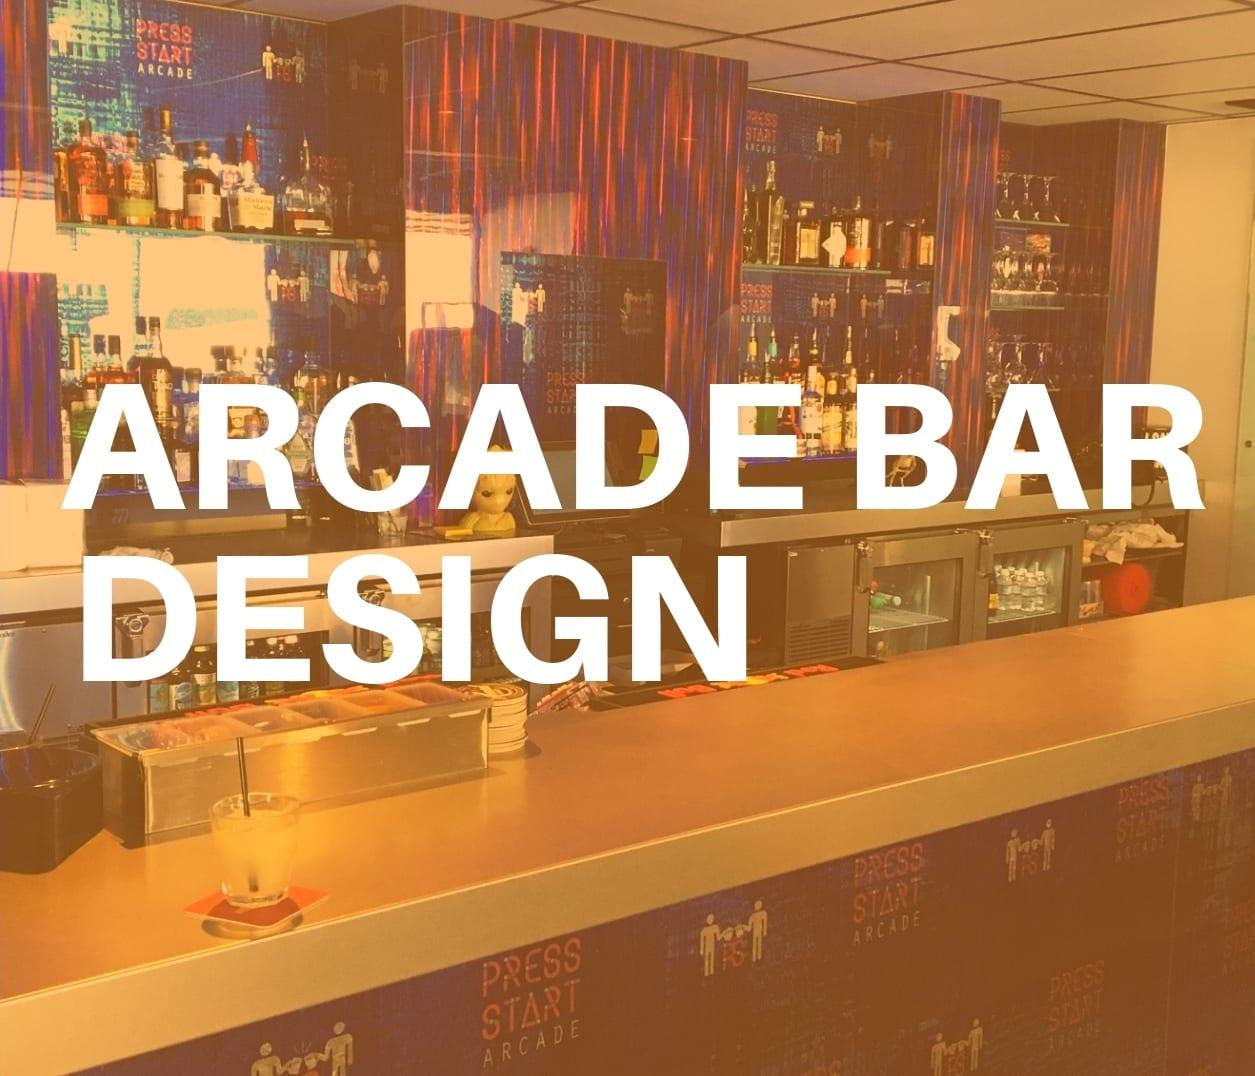 Arcade bar design for Press Start in Reno, NV